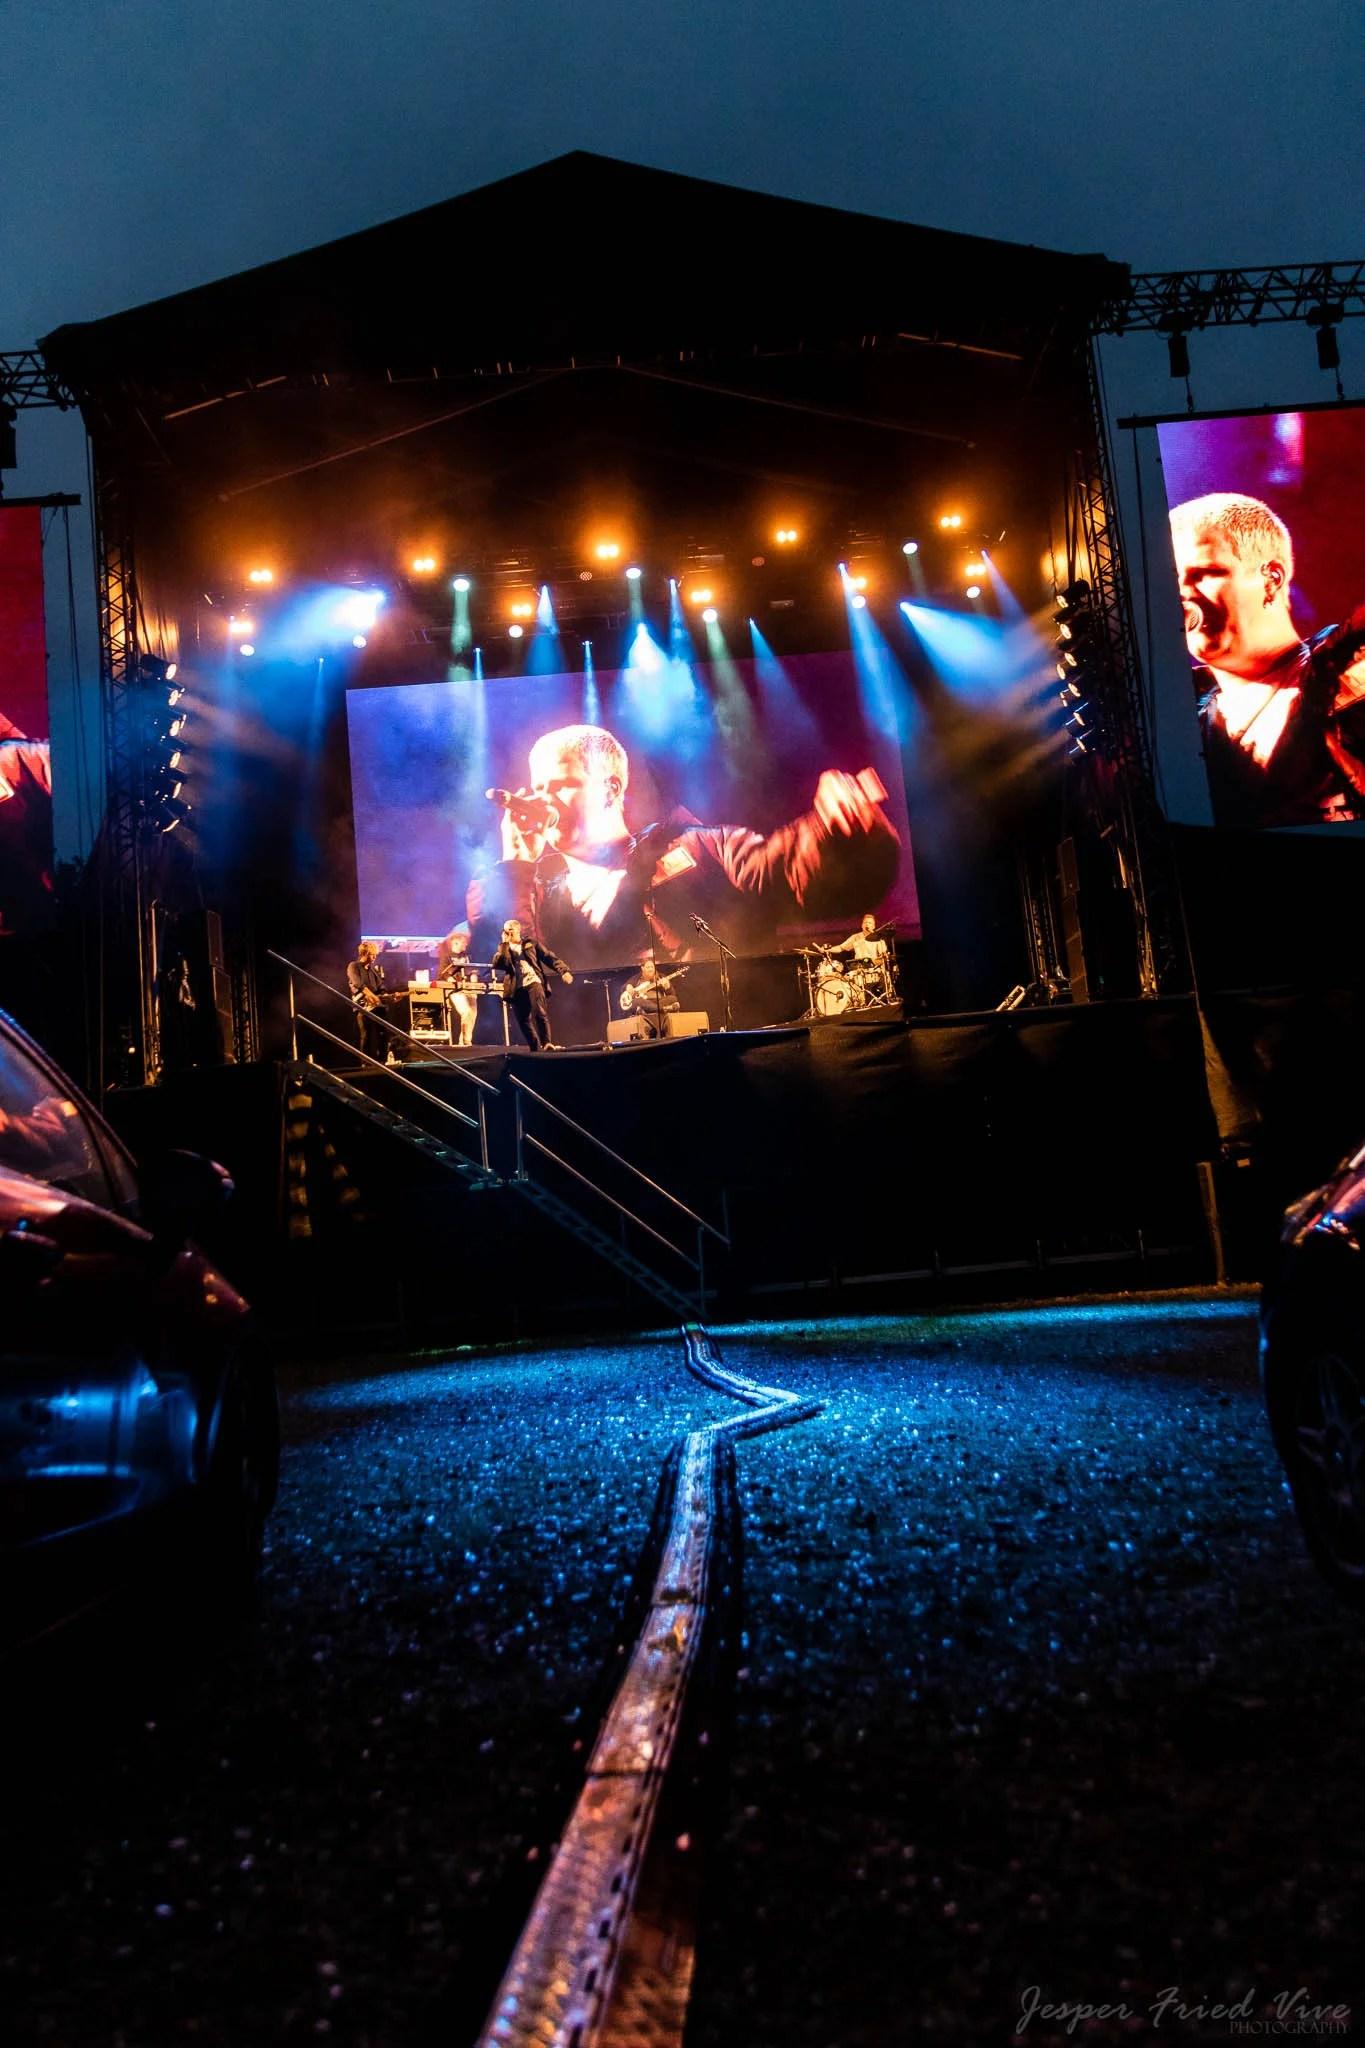 Phlake // Drive in koncert i Odense